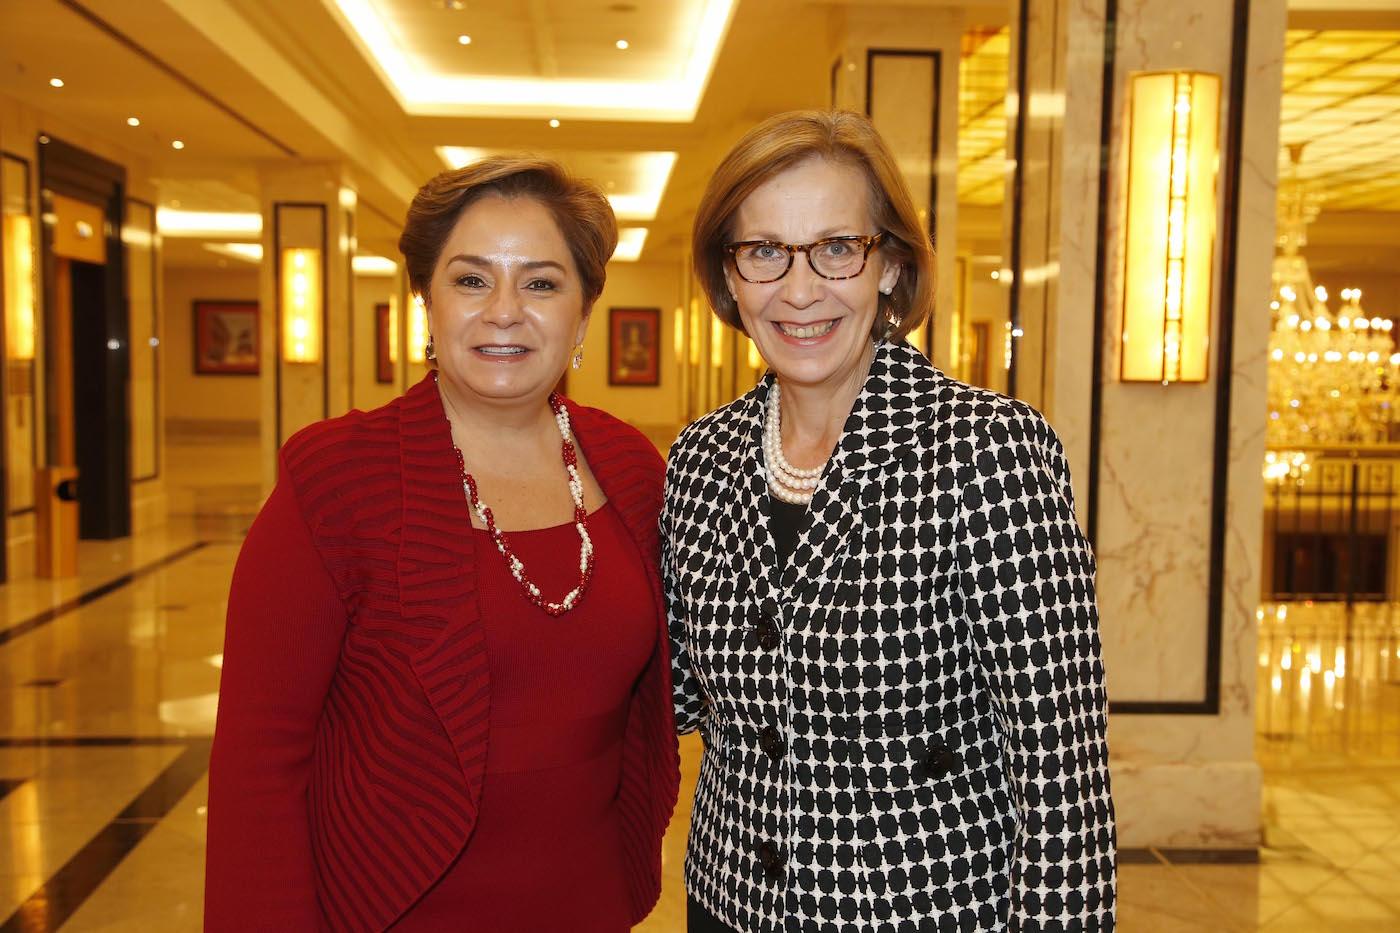 I.E. Patricia Espinosa Cantellano (Botschafterin Mexico), I.E. Ritva Koukku-Ronde (Botschafterin Finnland) beim bei der Ambassadors Club Veranstaltung -Women for Peace- im MARITIM Hotel berlin.